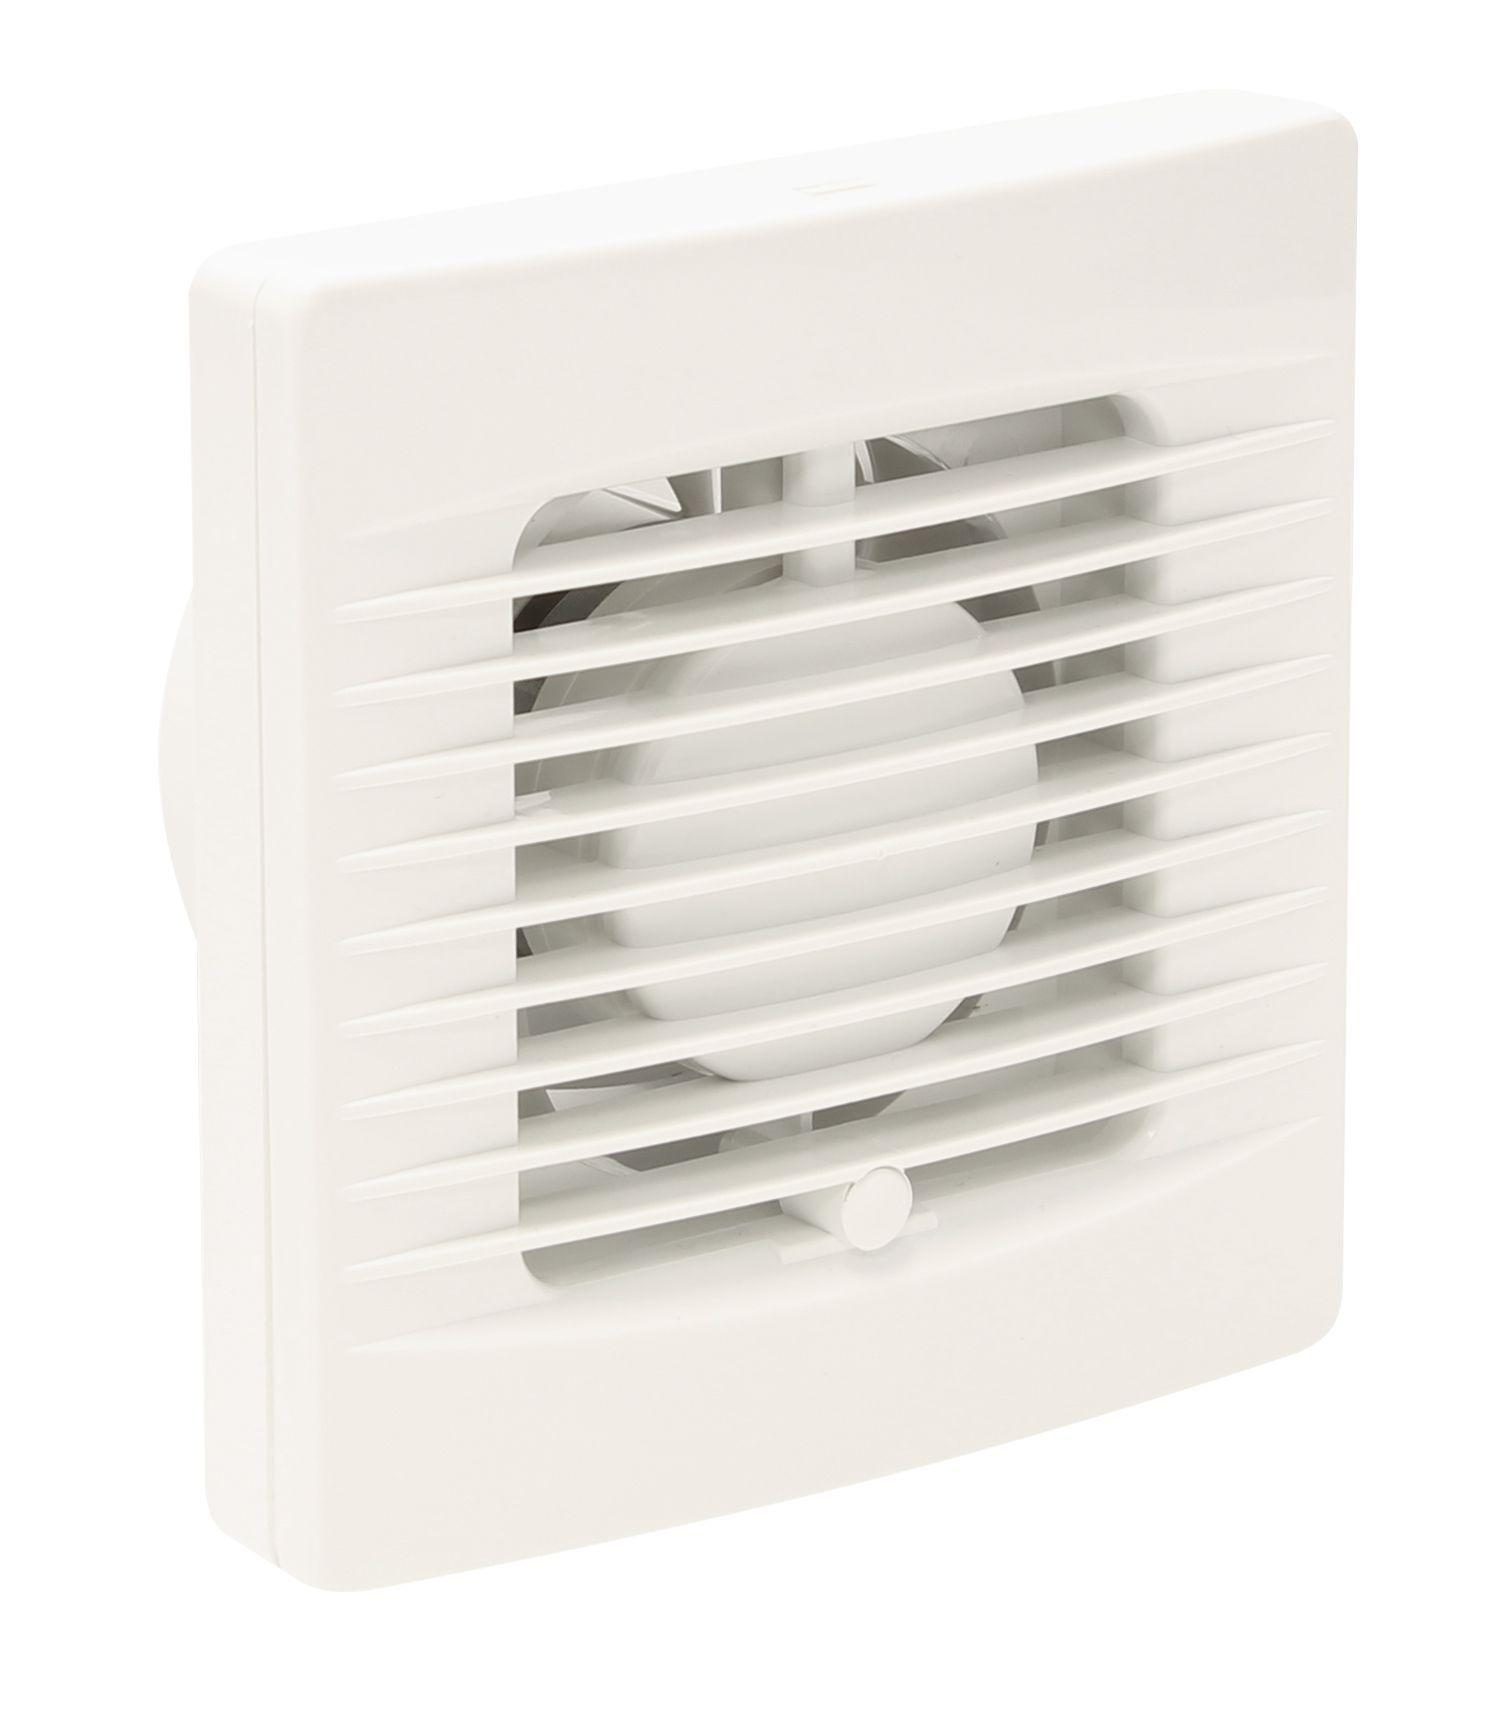 manrose fan wiring diagram toilet plumbing extractor bathroom b andq dutchfreecard